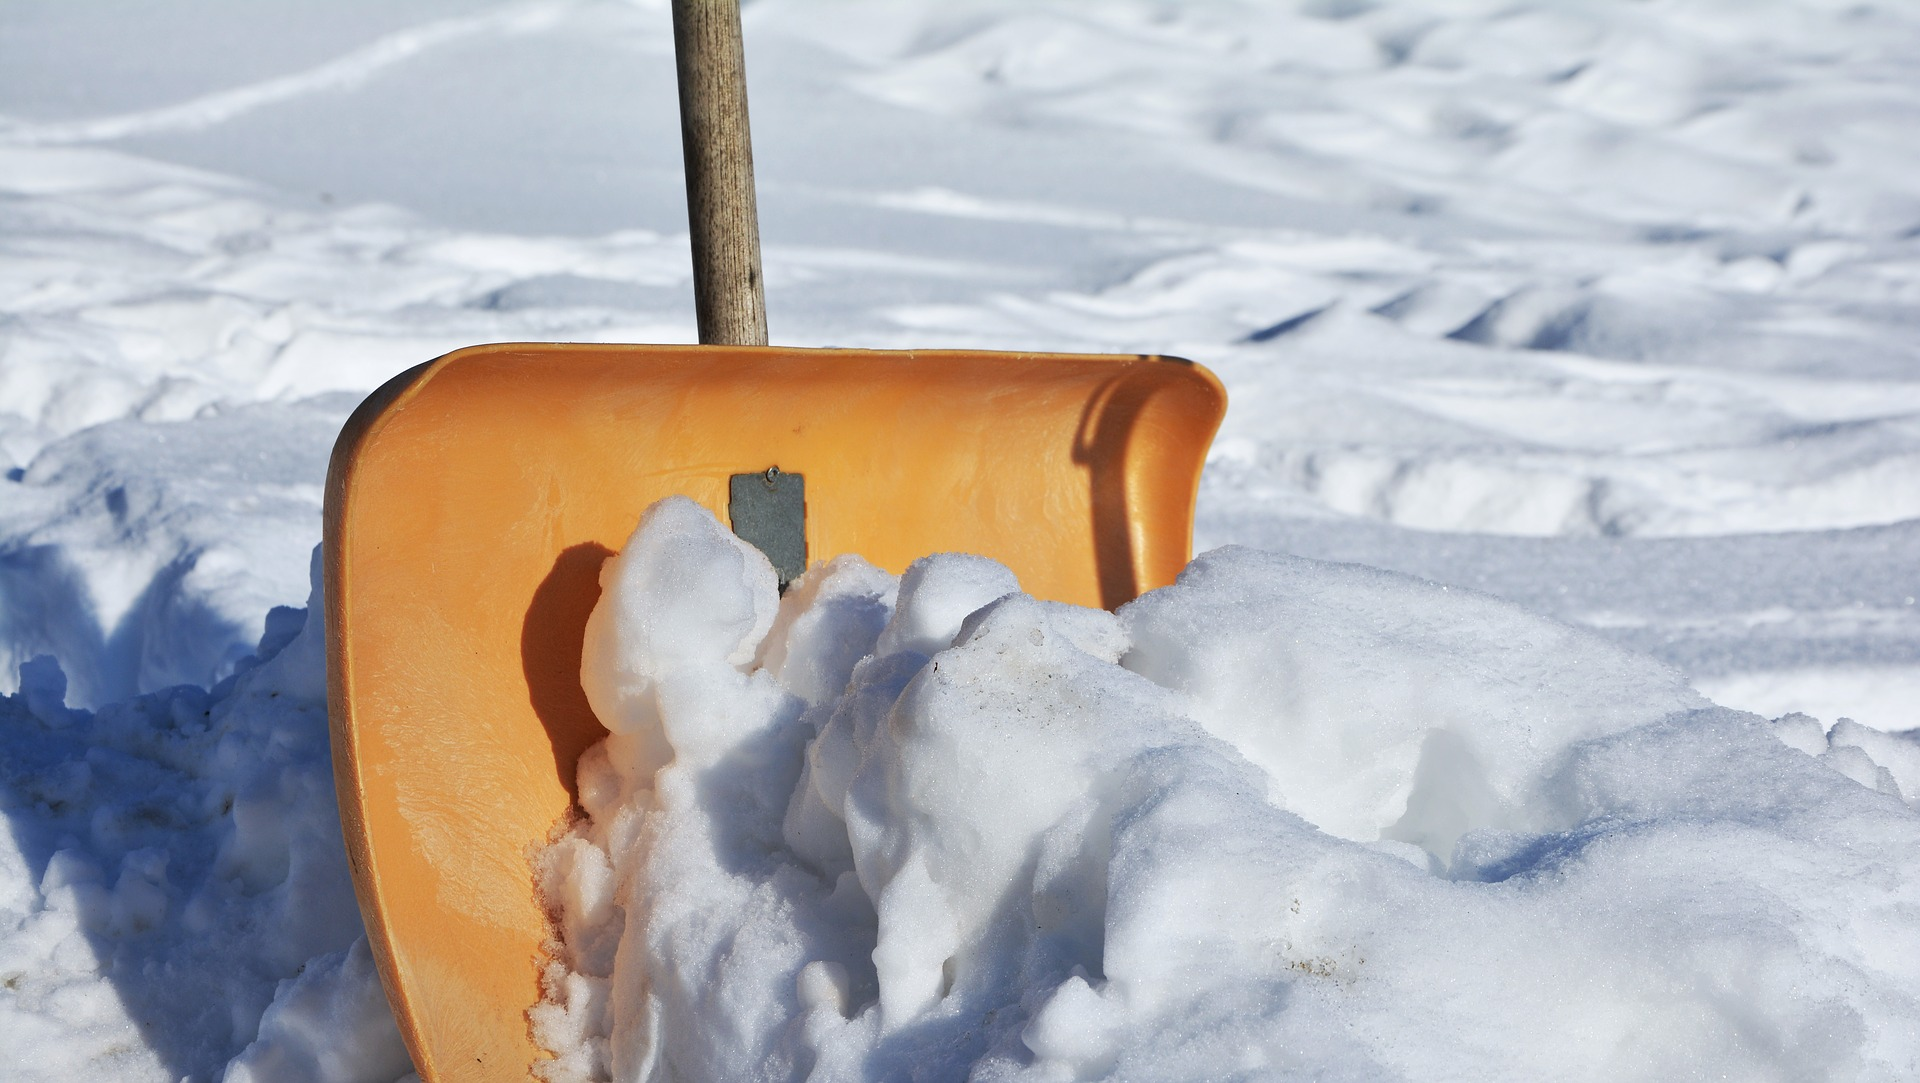 snow-shovel-2001776_1920